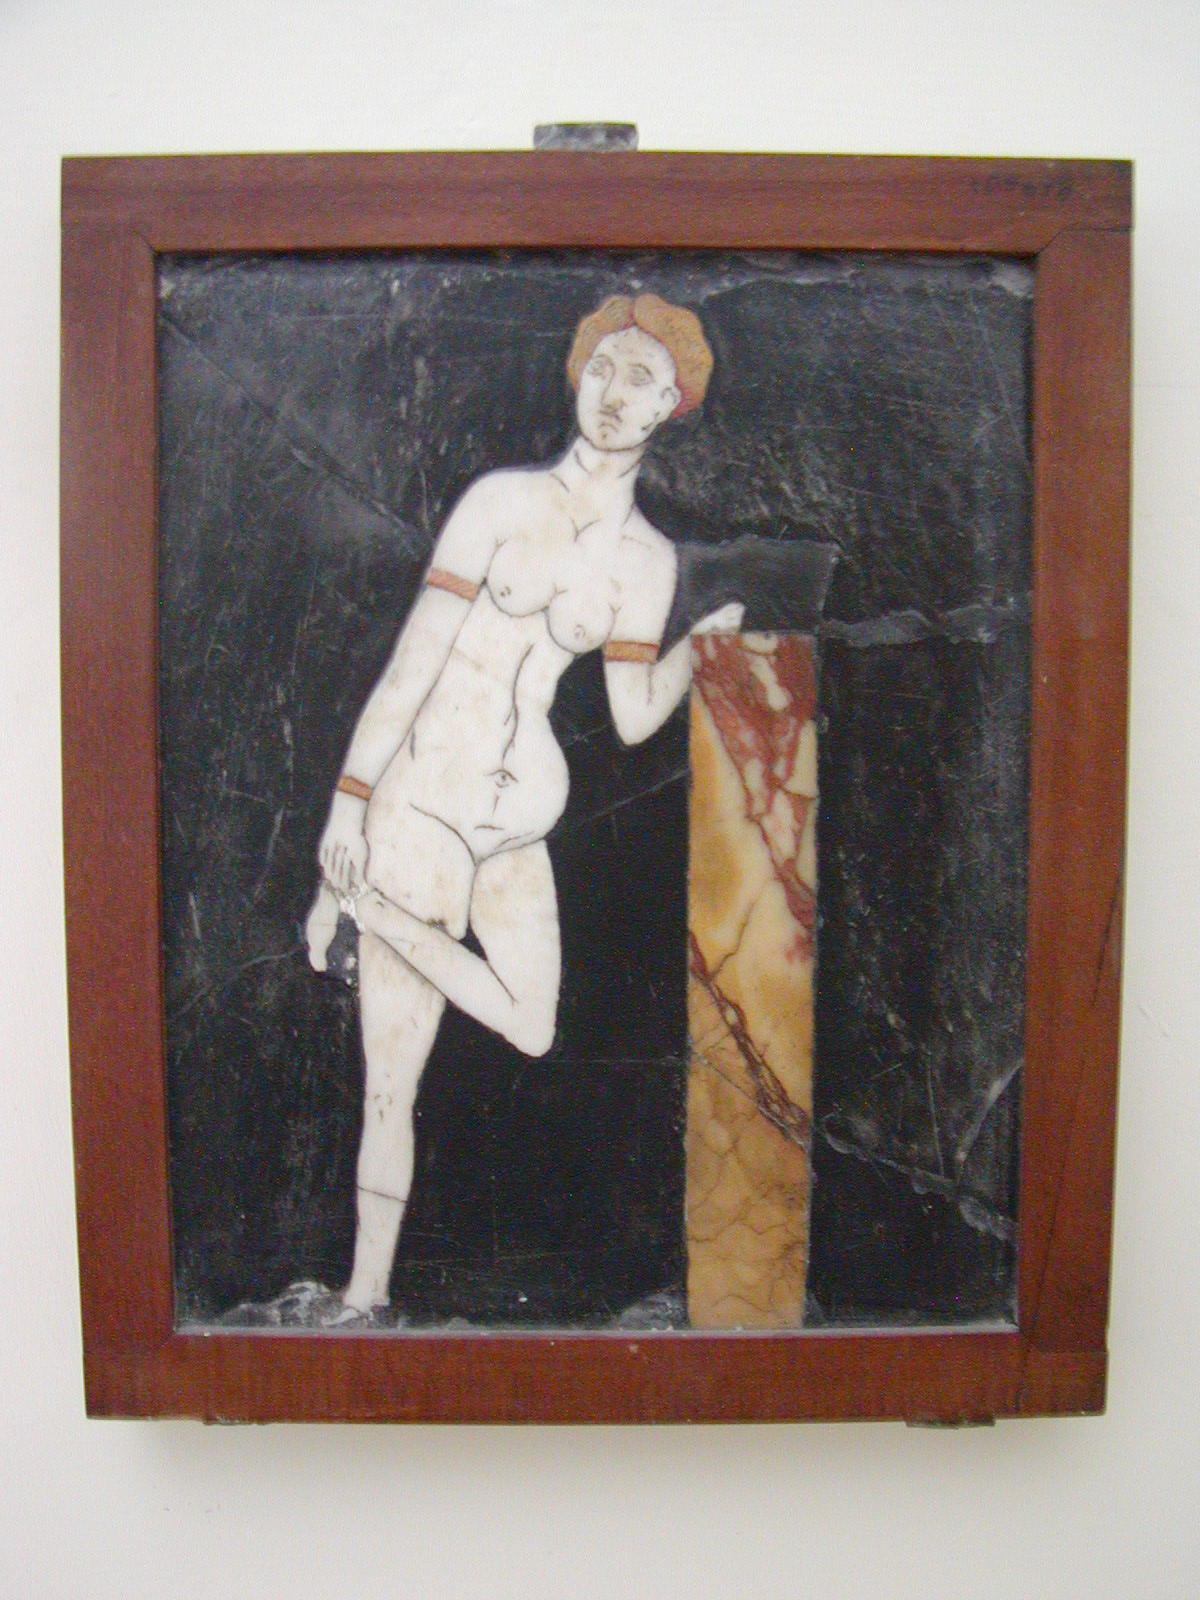 Museo Archeologico Nazionale - 2002-09-13-105419